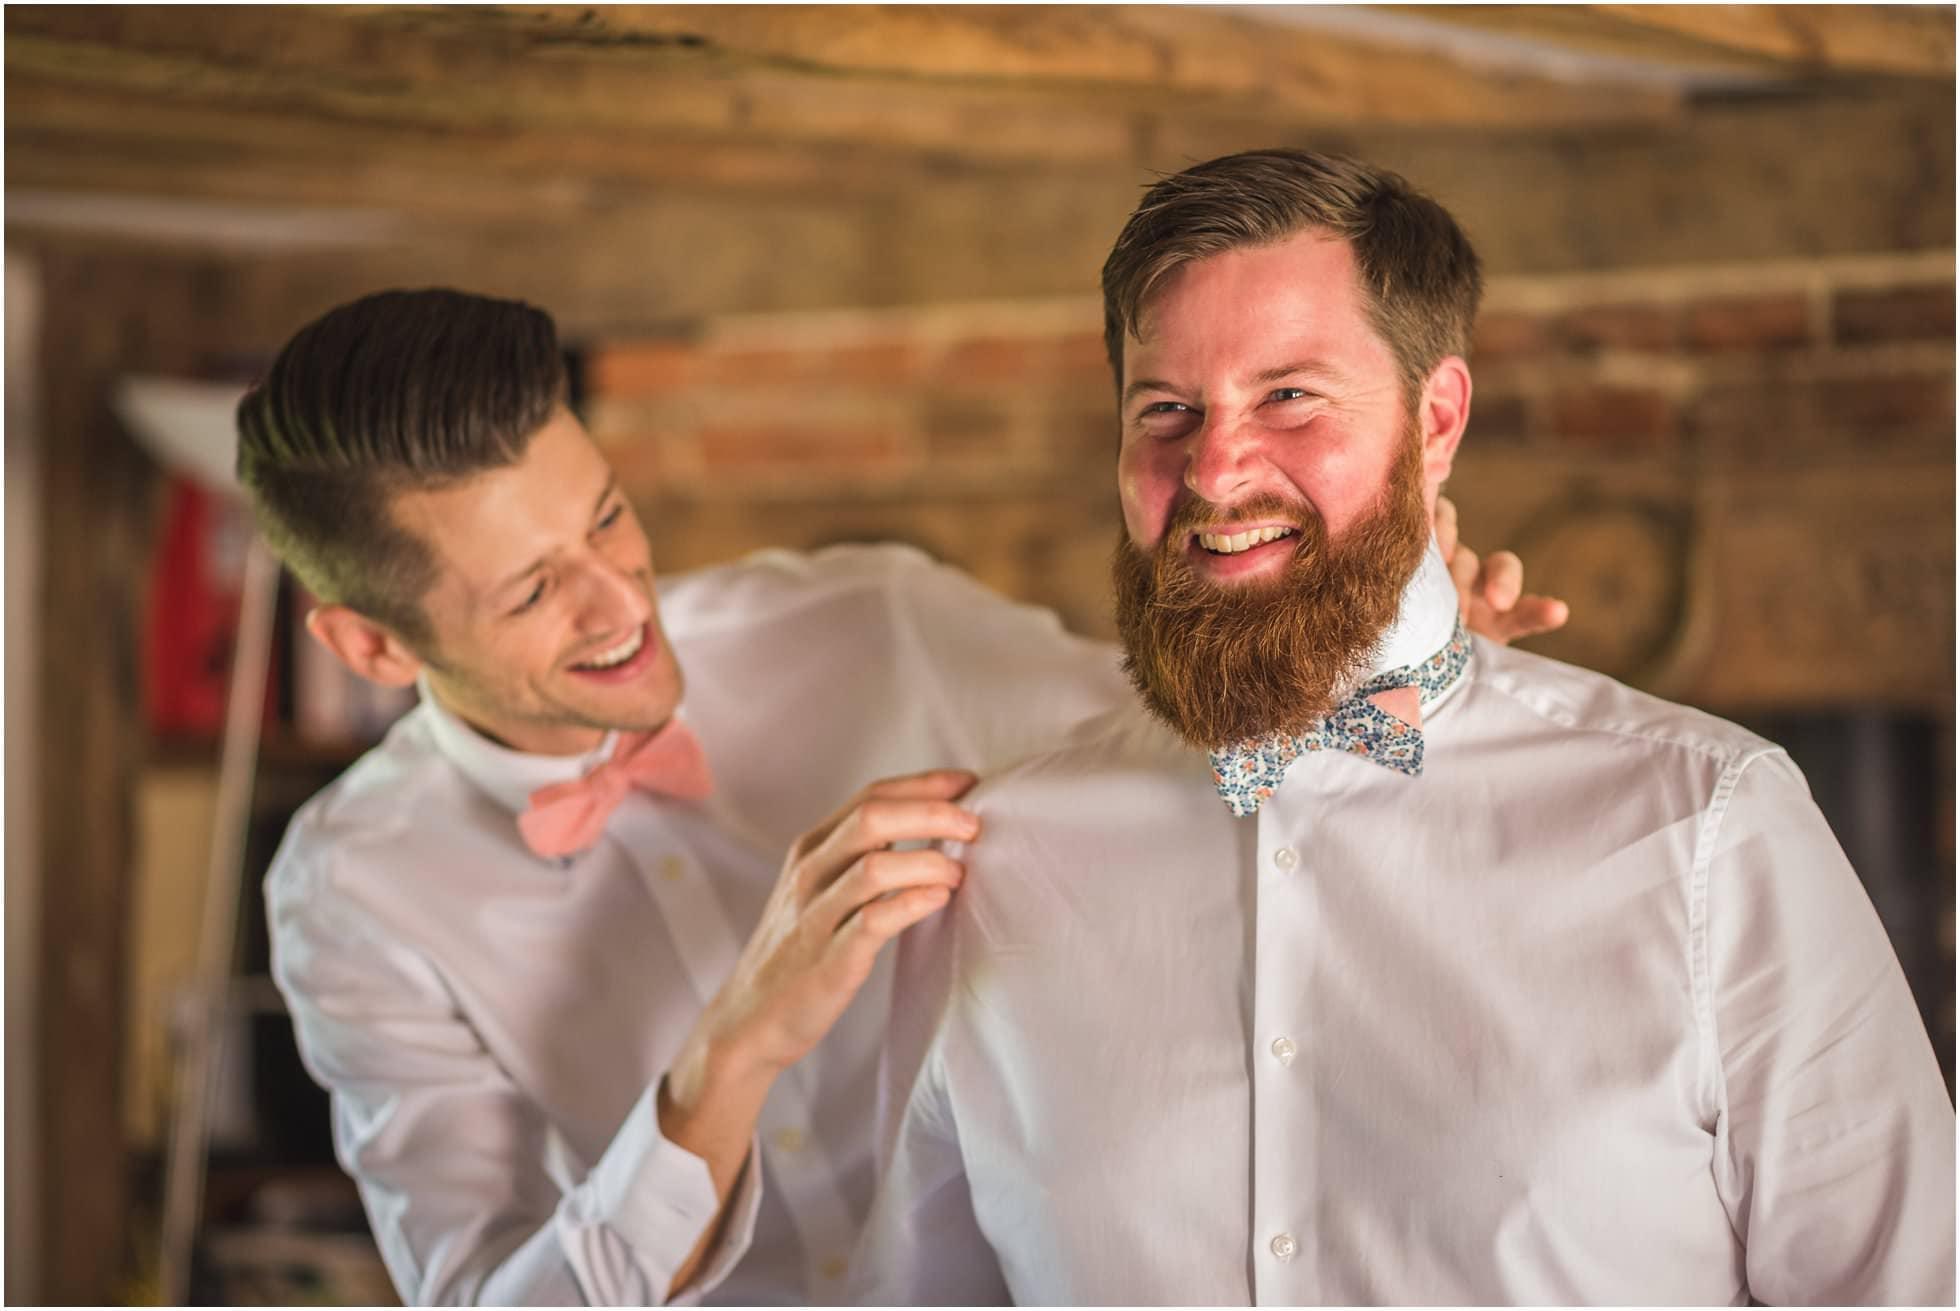 wedding bowties - the boys getting ready casual shots